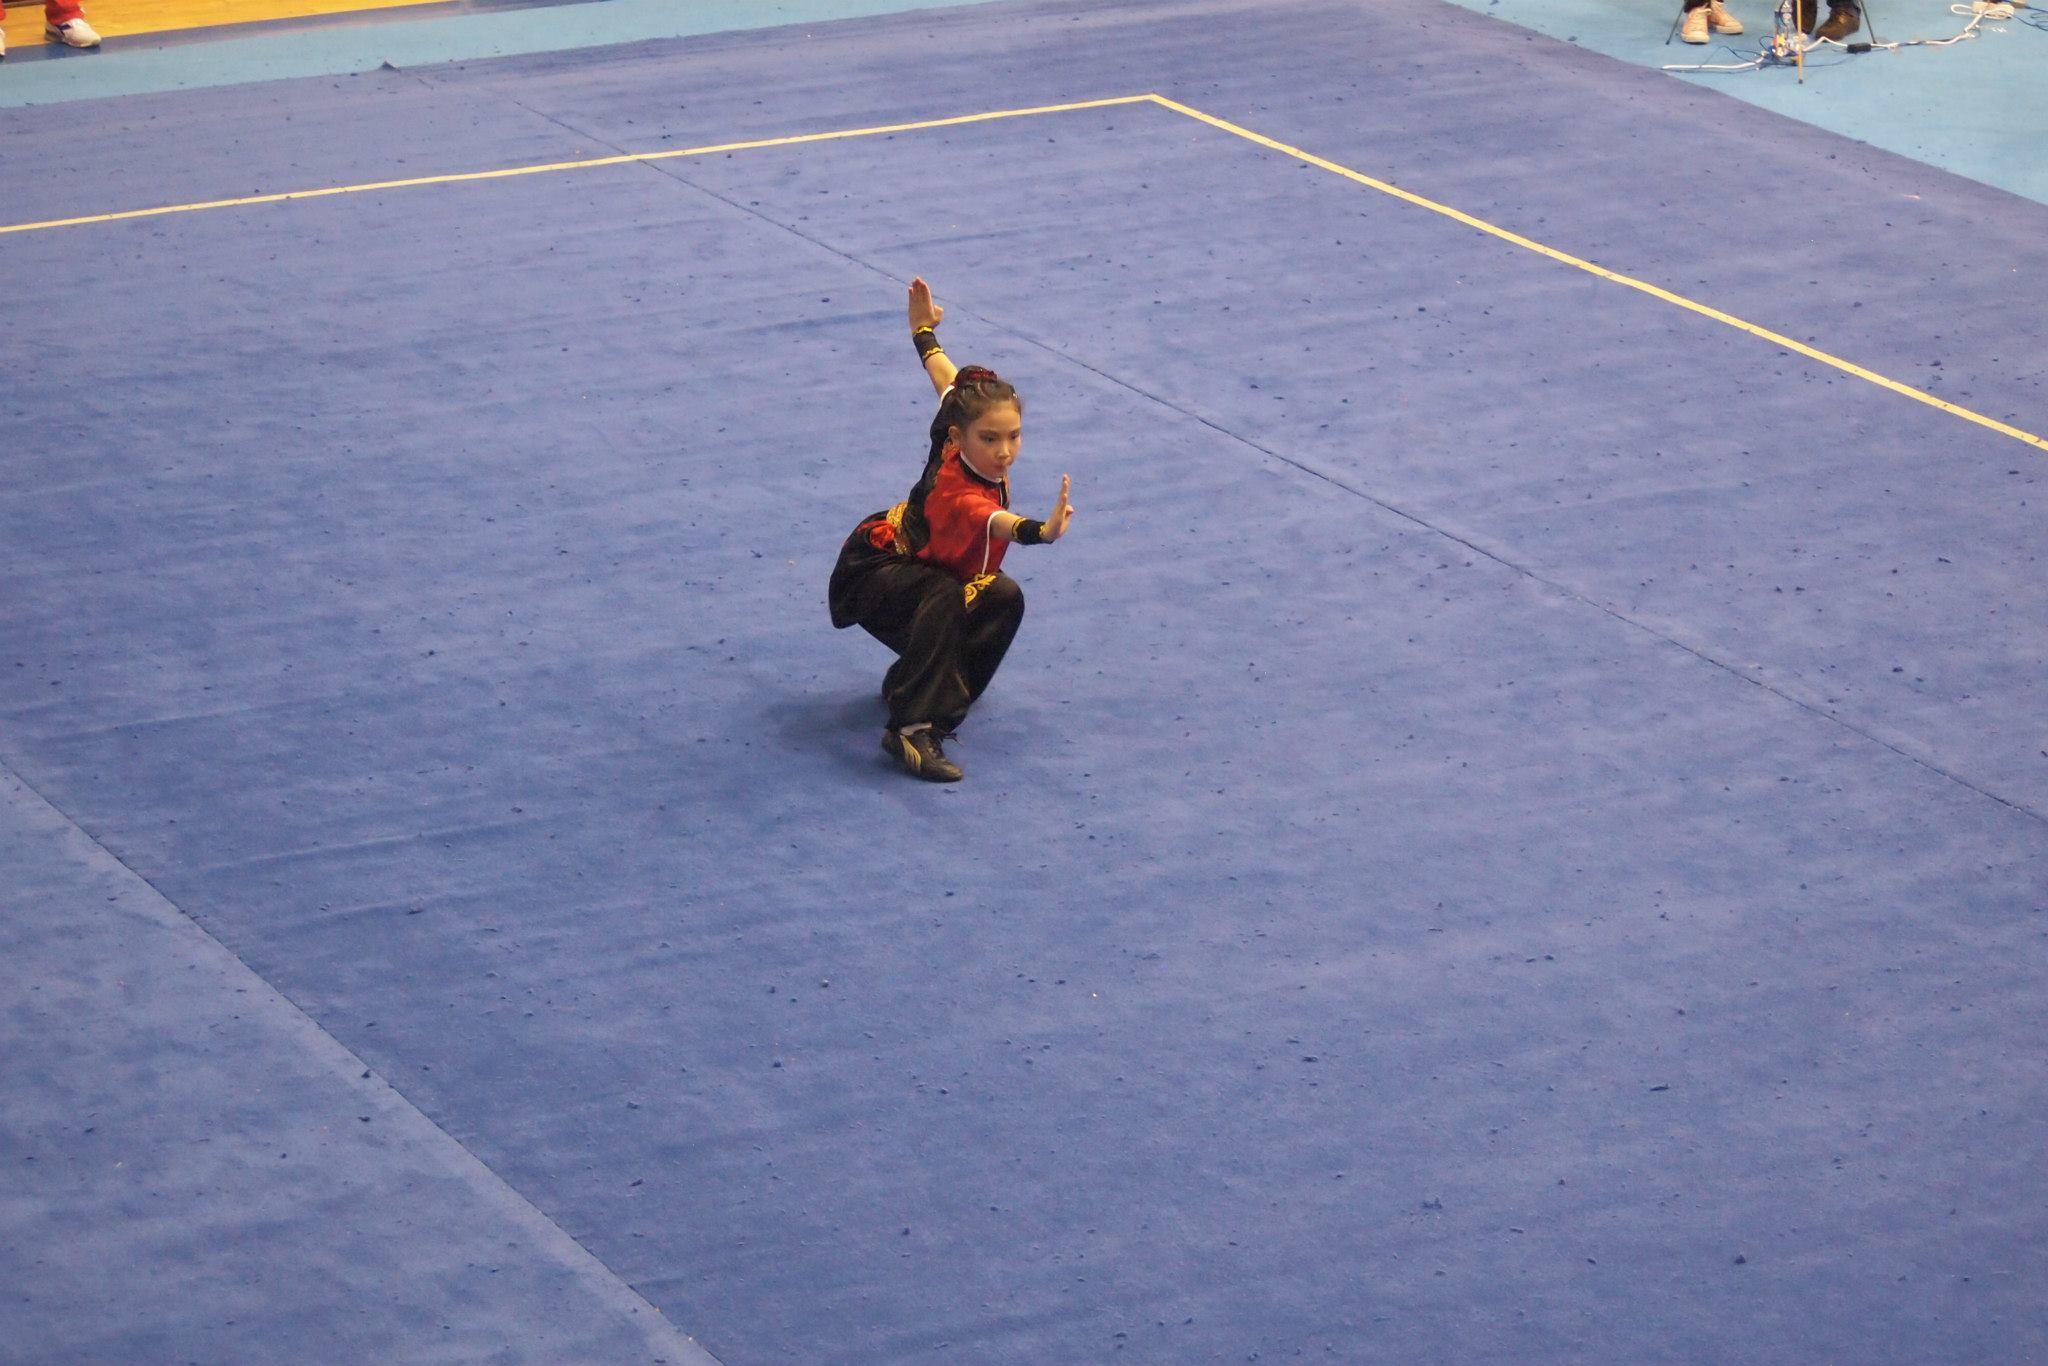 Wayland_Li_Wushu_World_Junior_Championships_2014_Team_Canada_in_Turkey_Erica_1.jpg